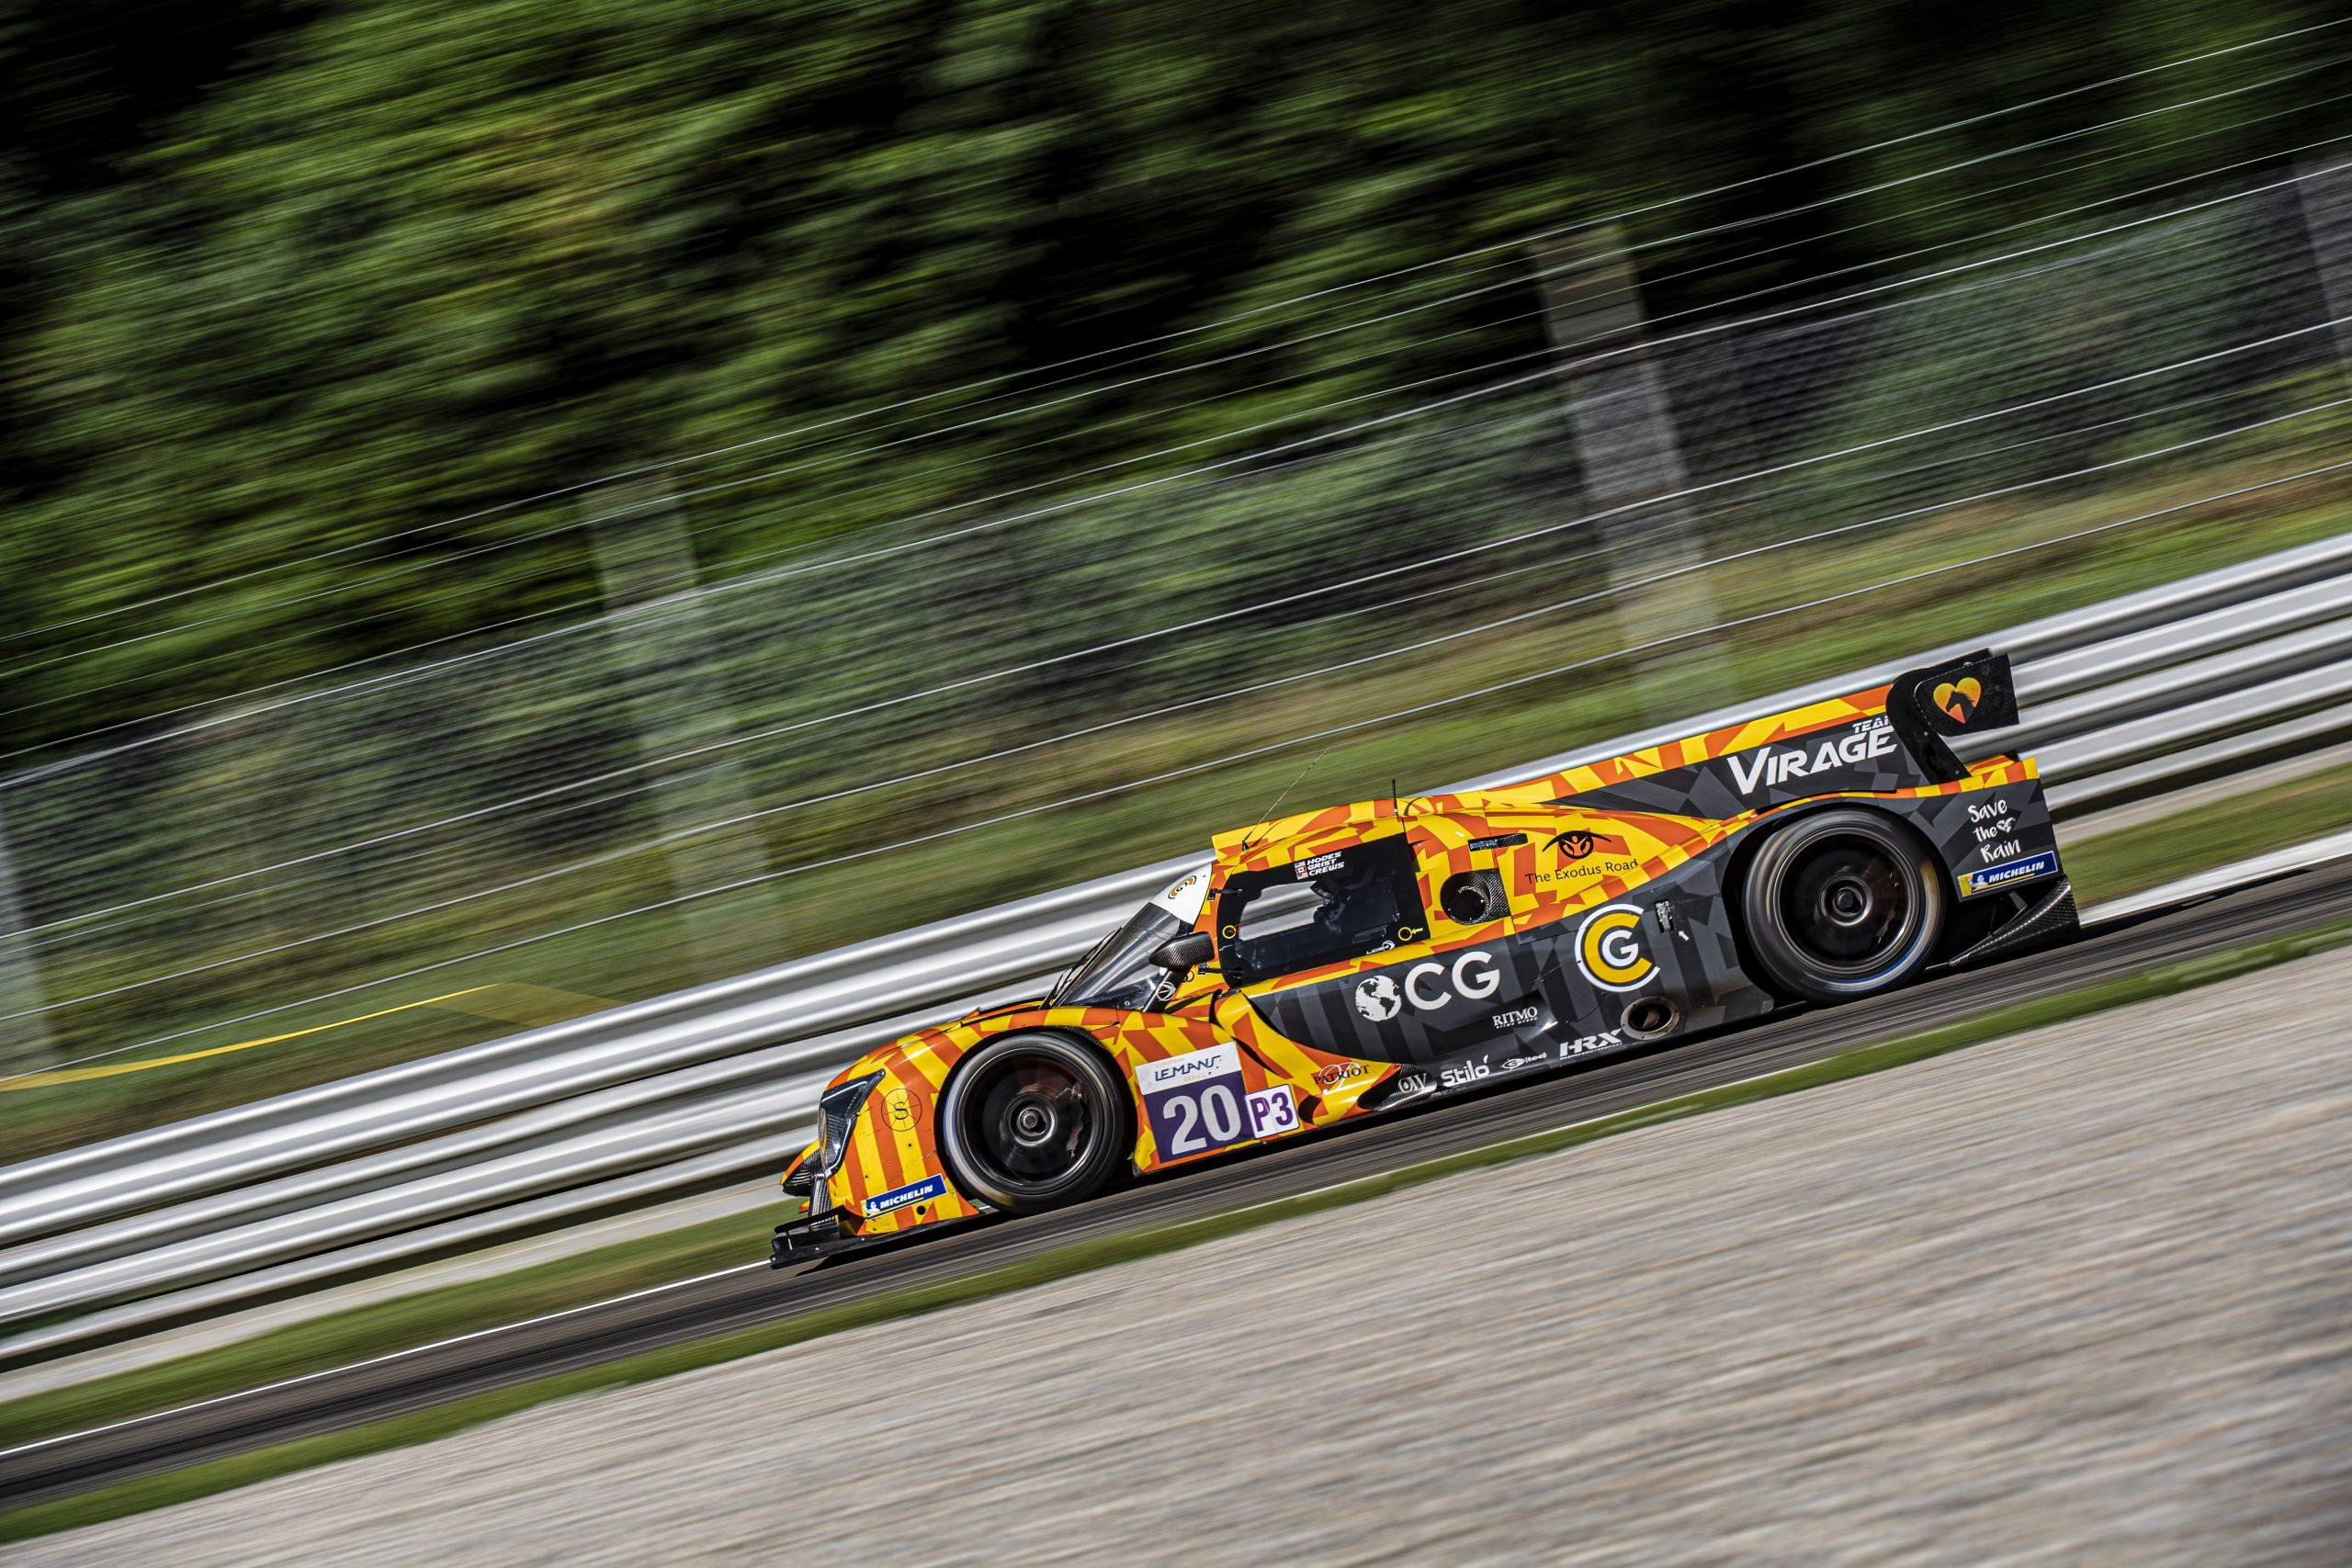 Team Virage scores best ELMS result to date in Monza